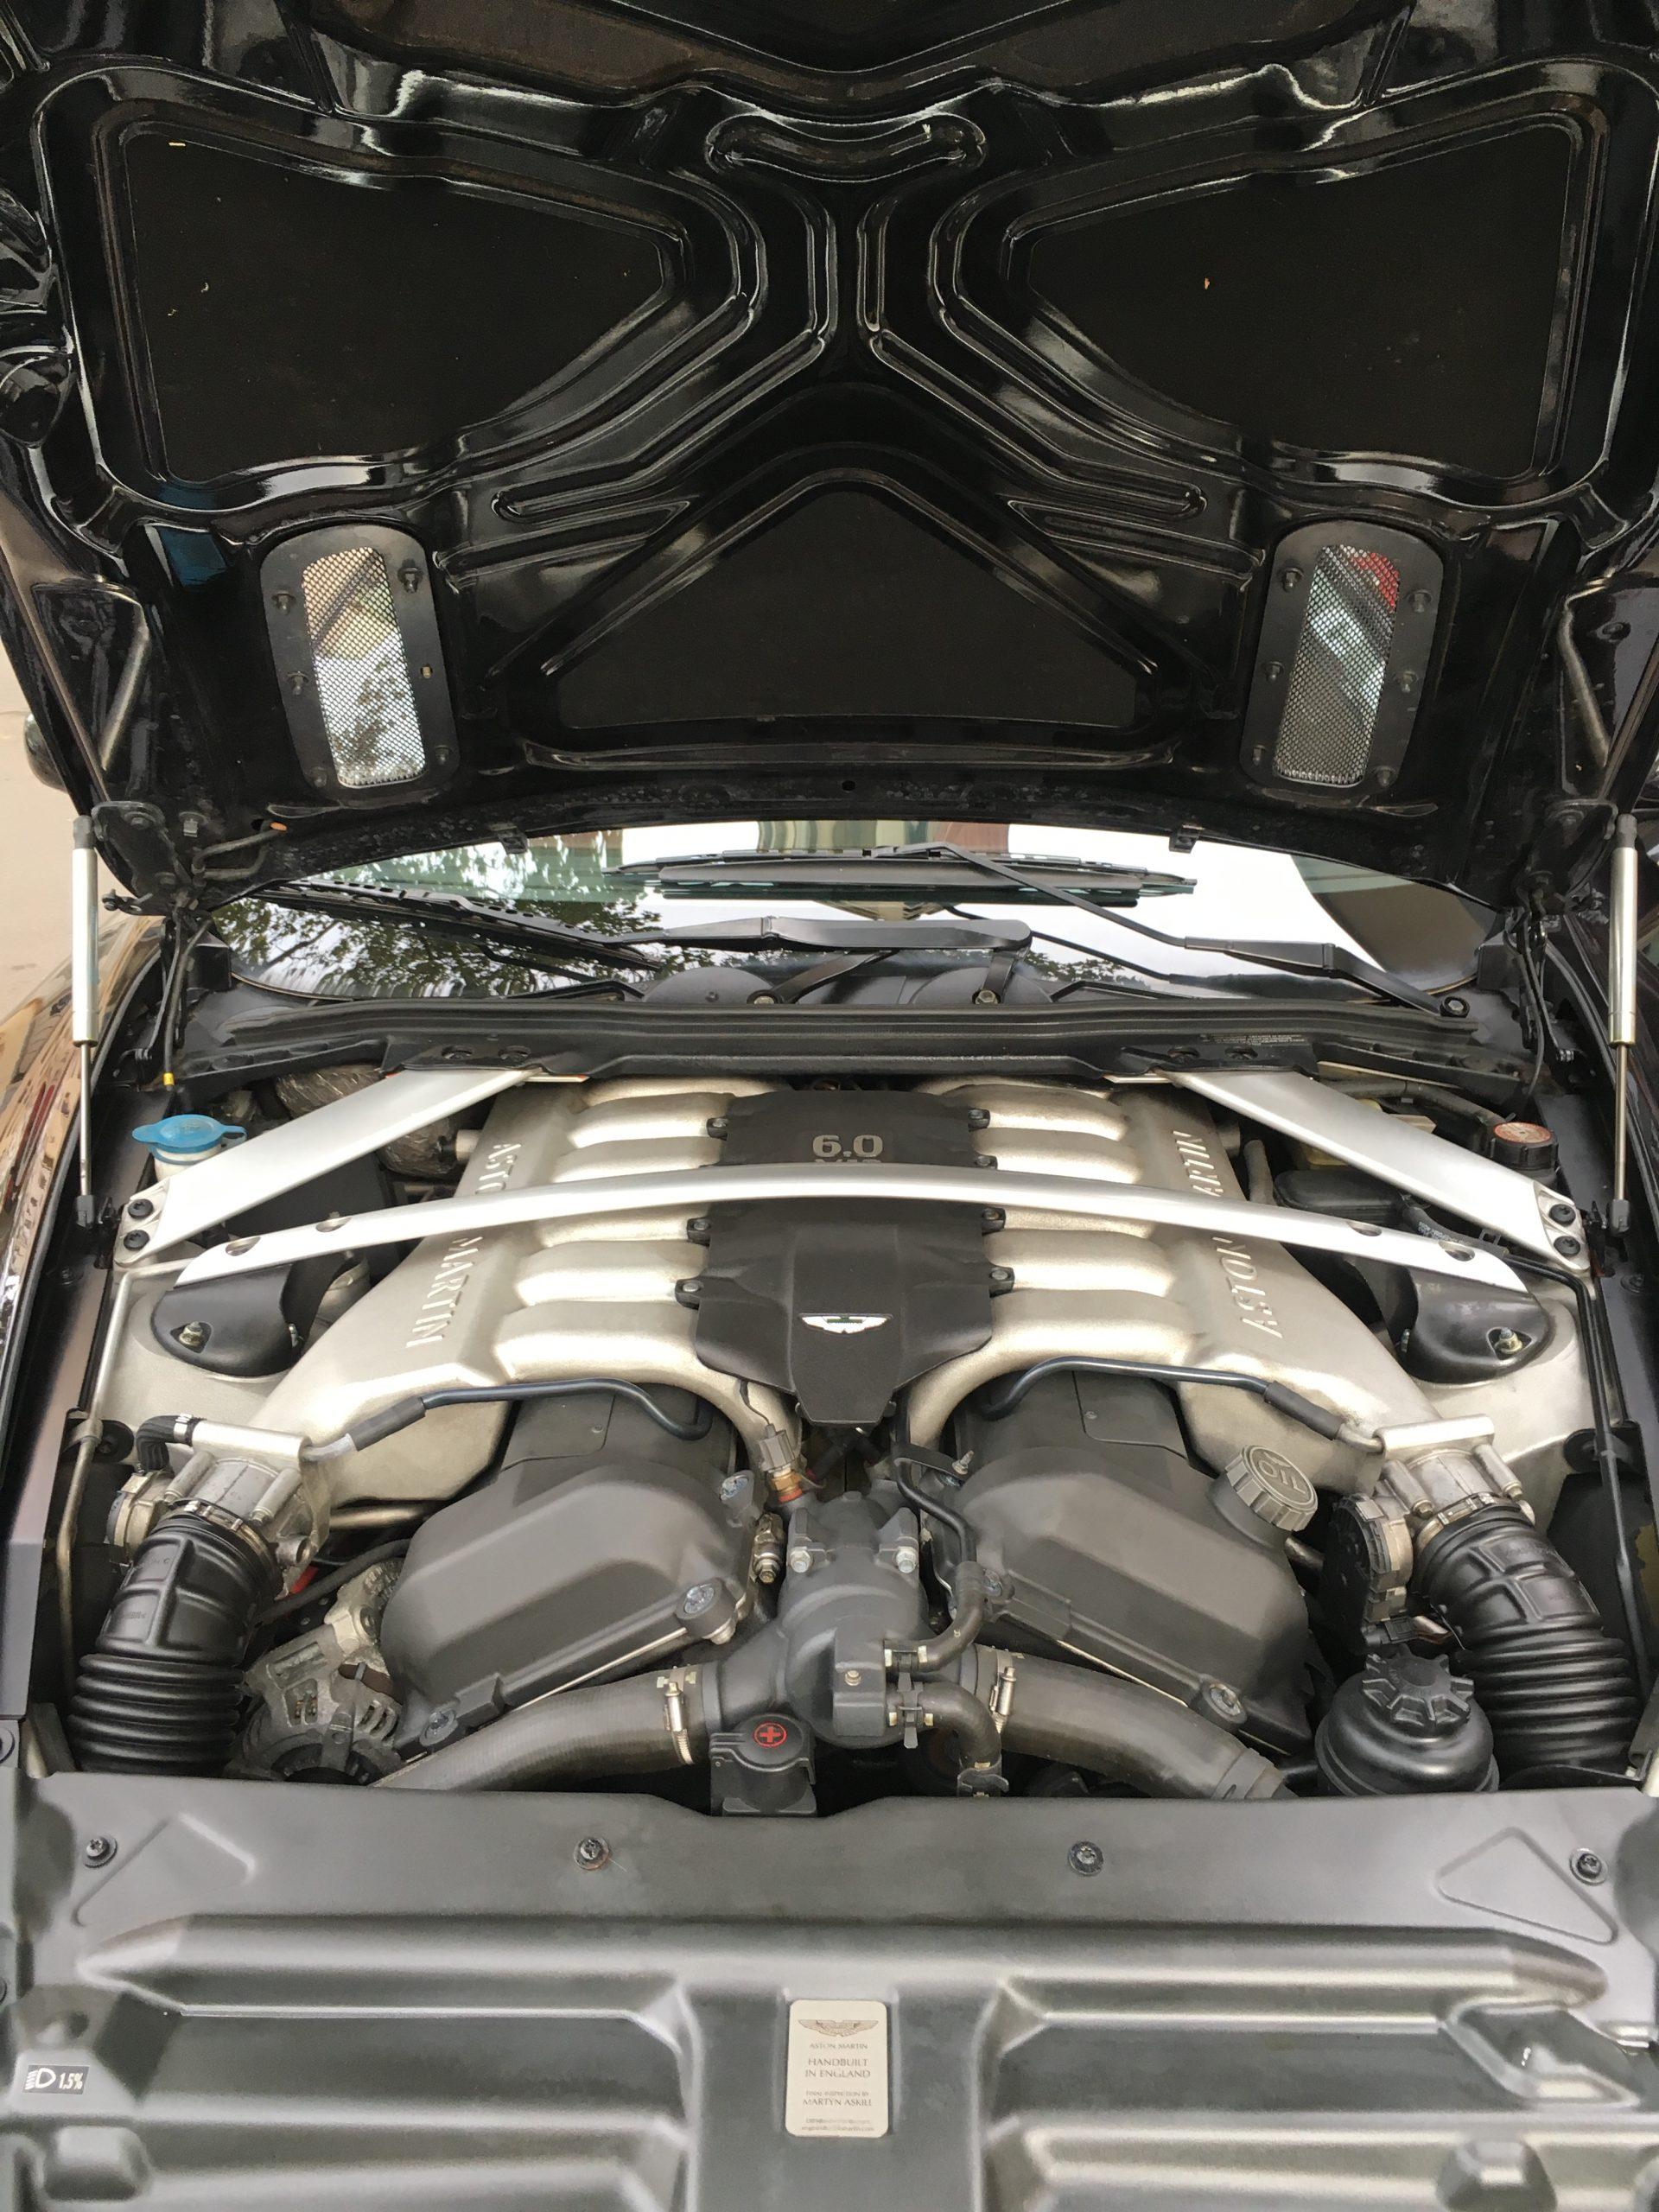 aston martin db9 coupe 5.9 v12 touchtronic